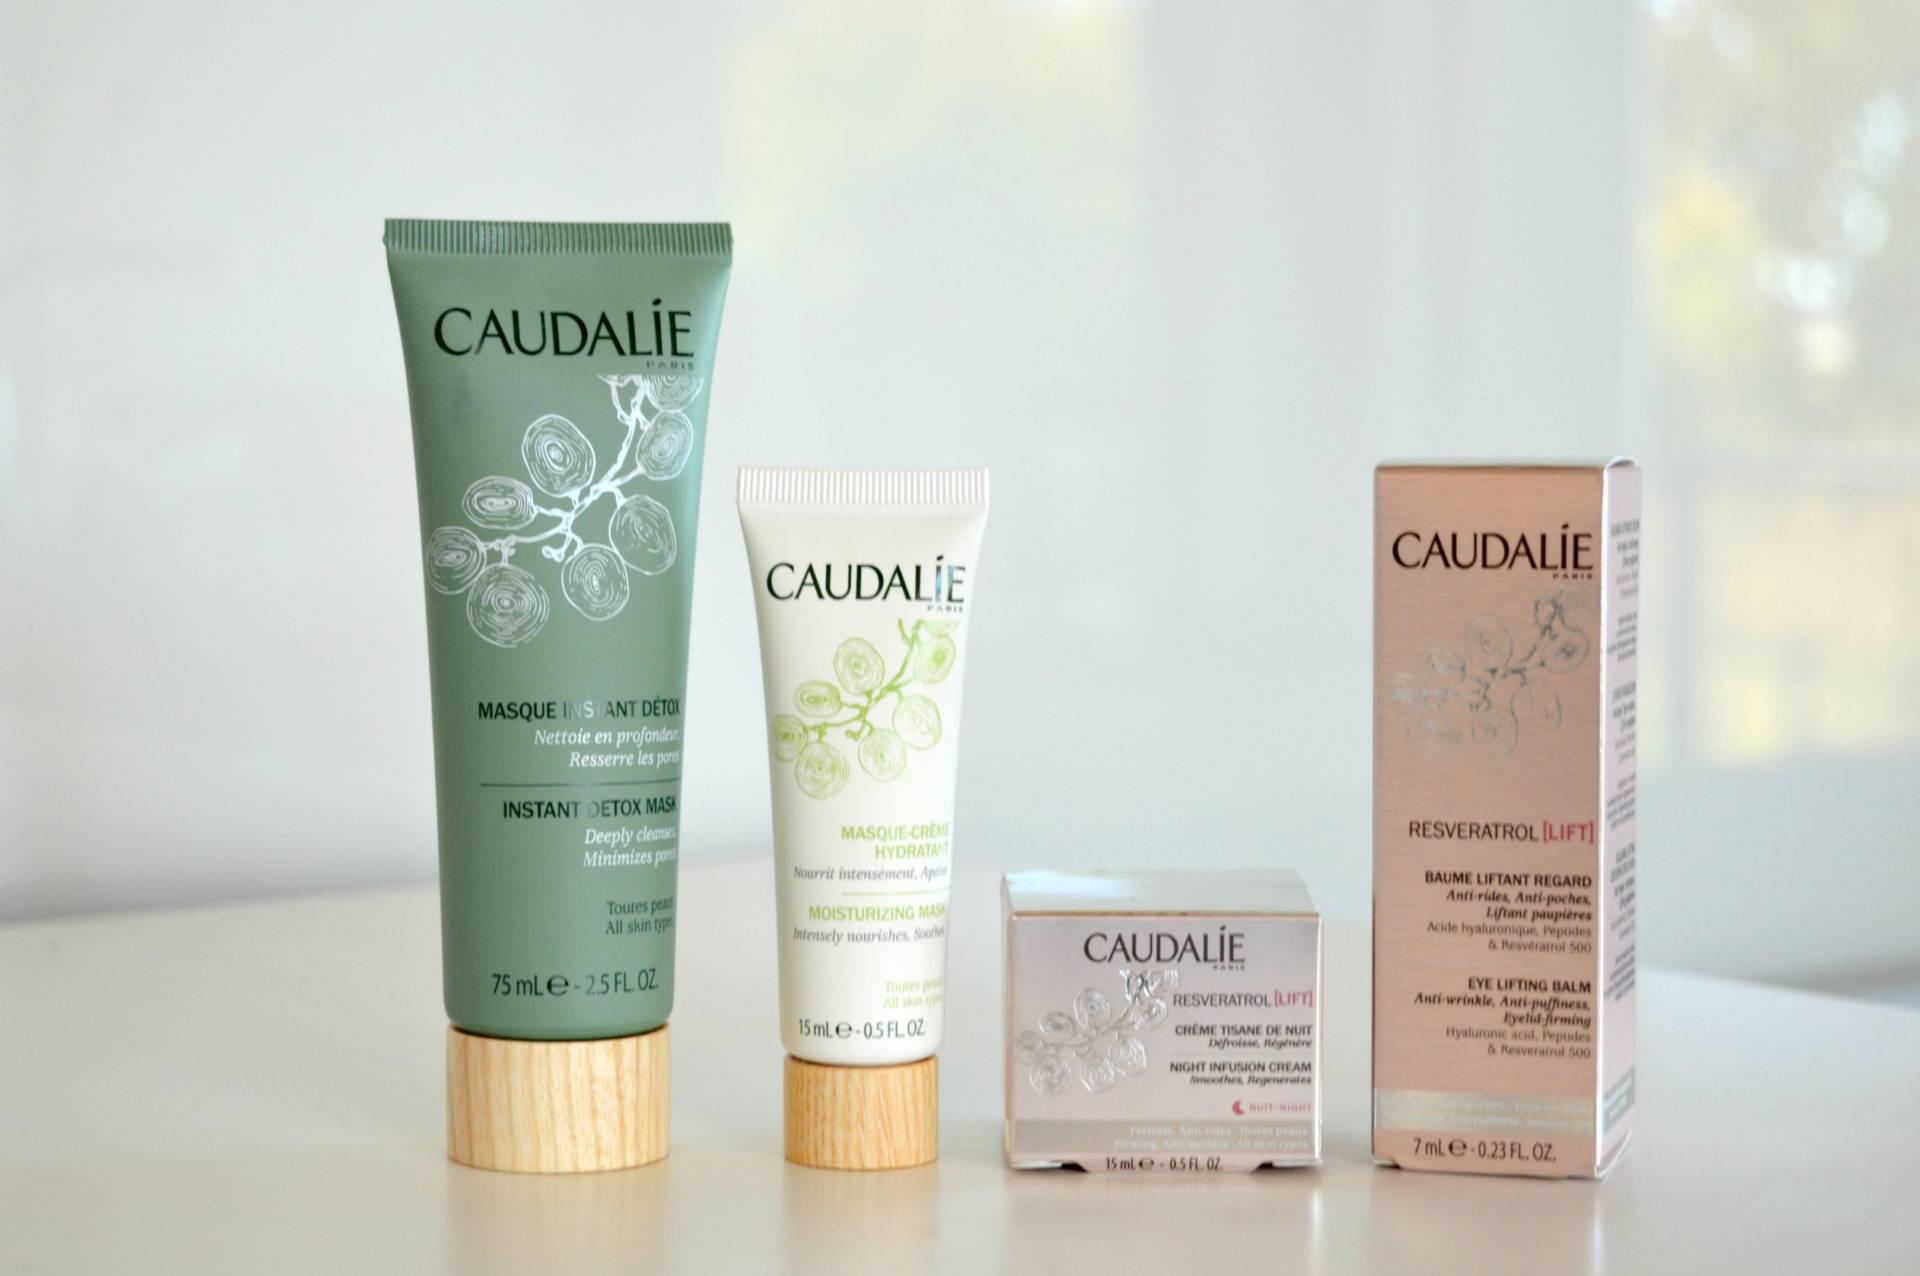 caudalie-french-pharmacy-inhautepursuit-haul-shopping-travel